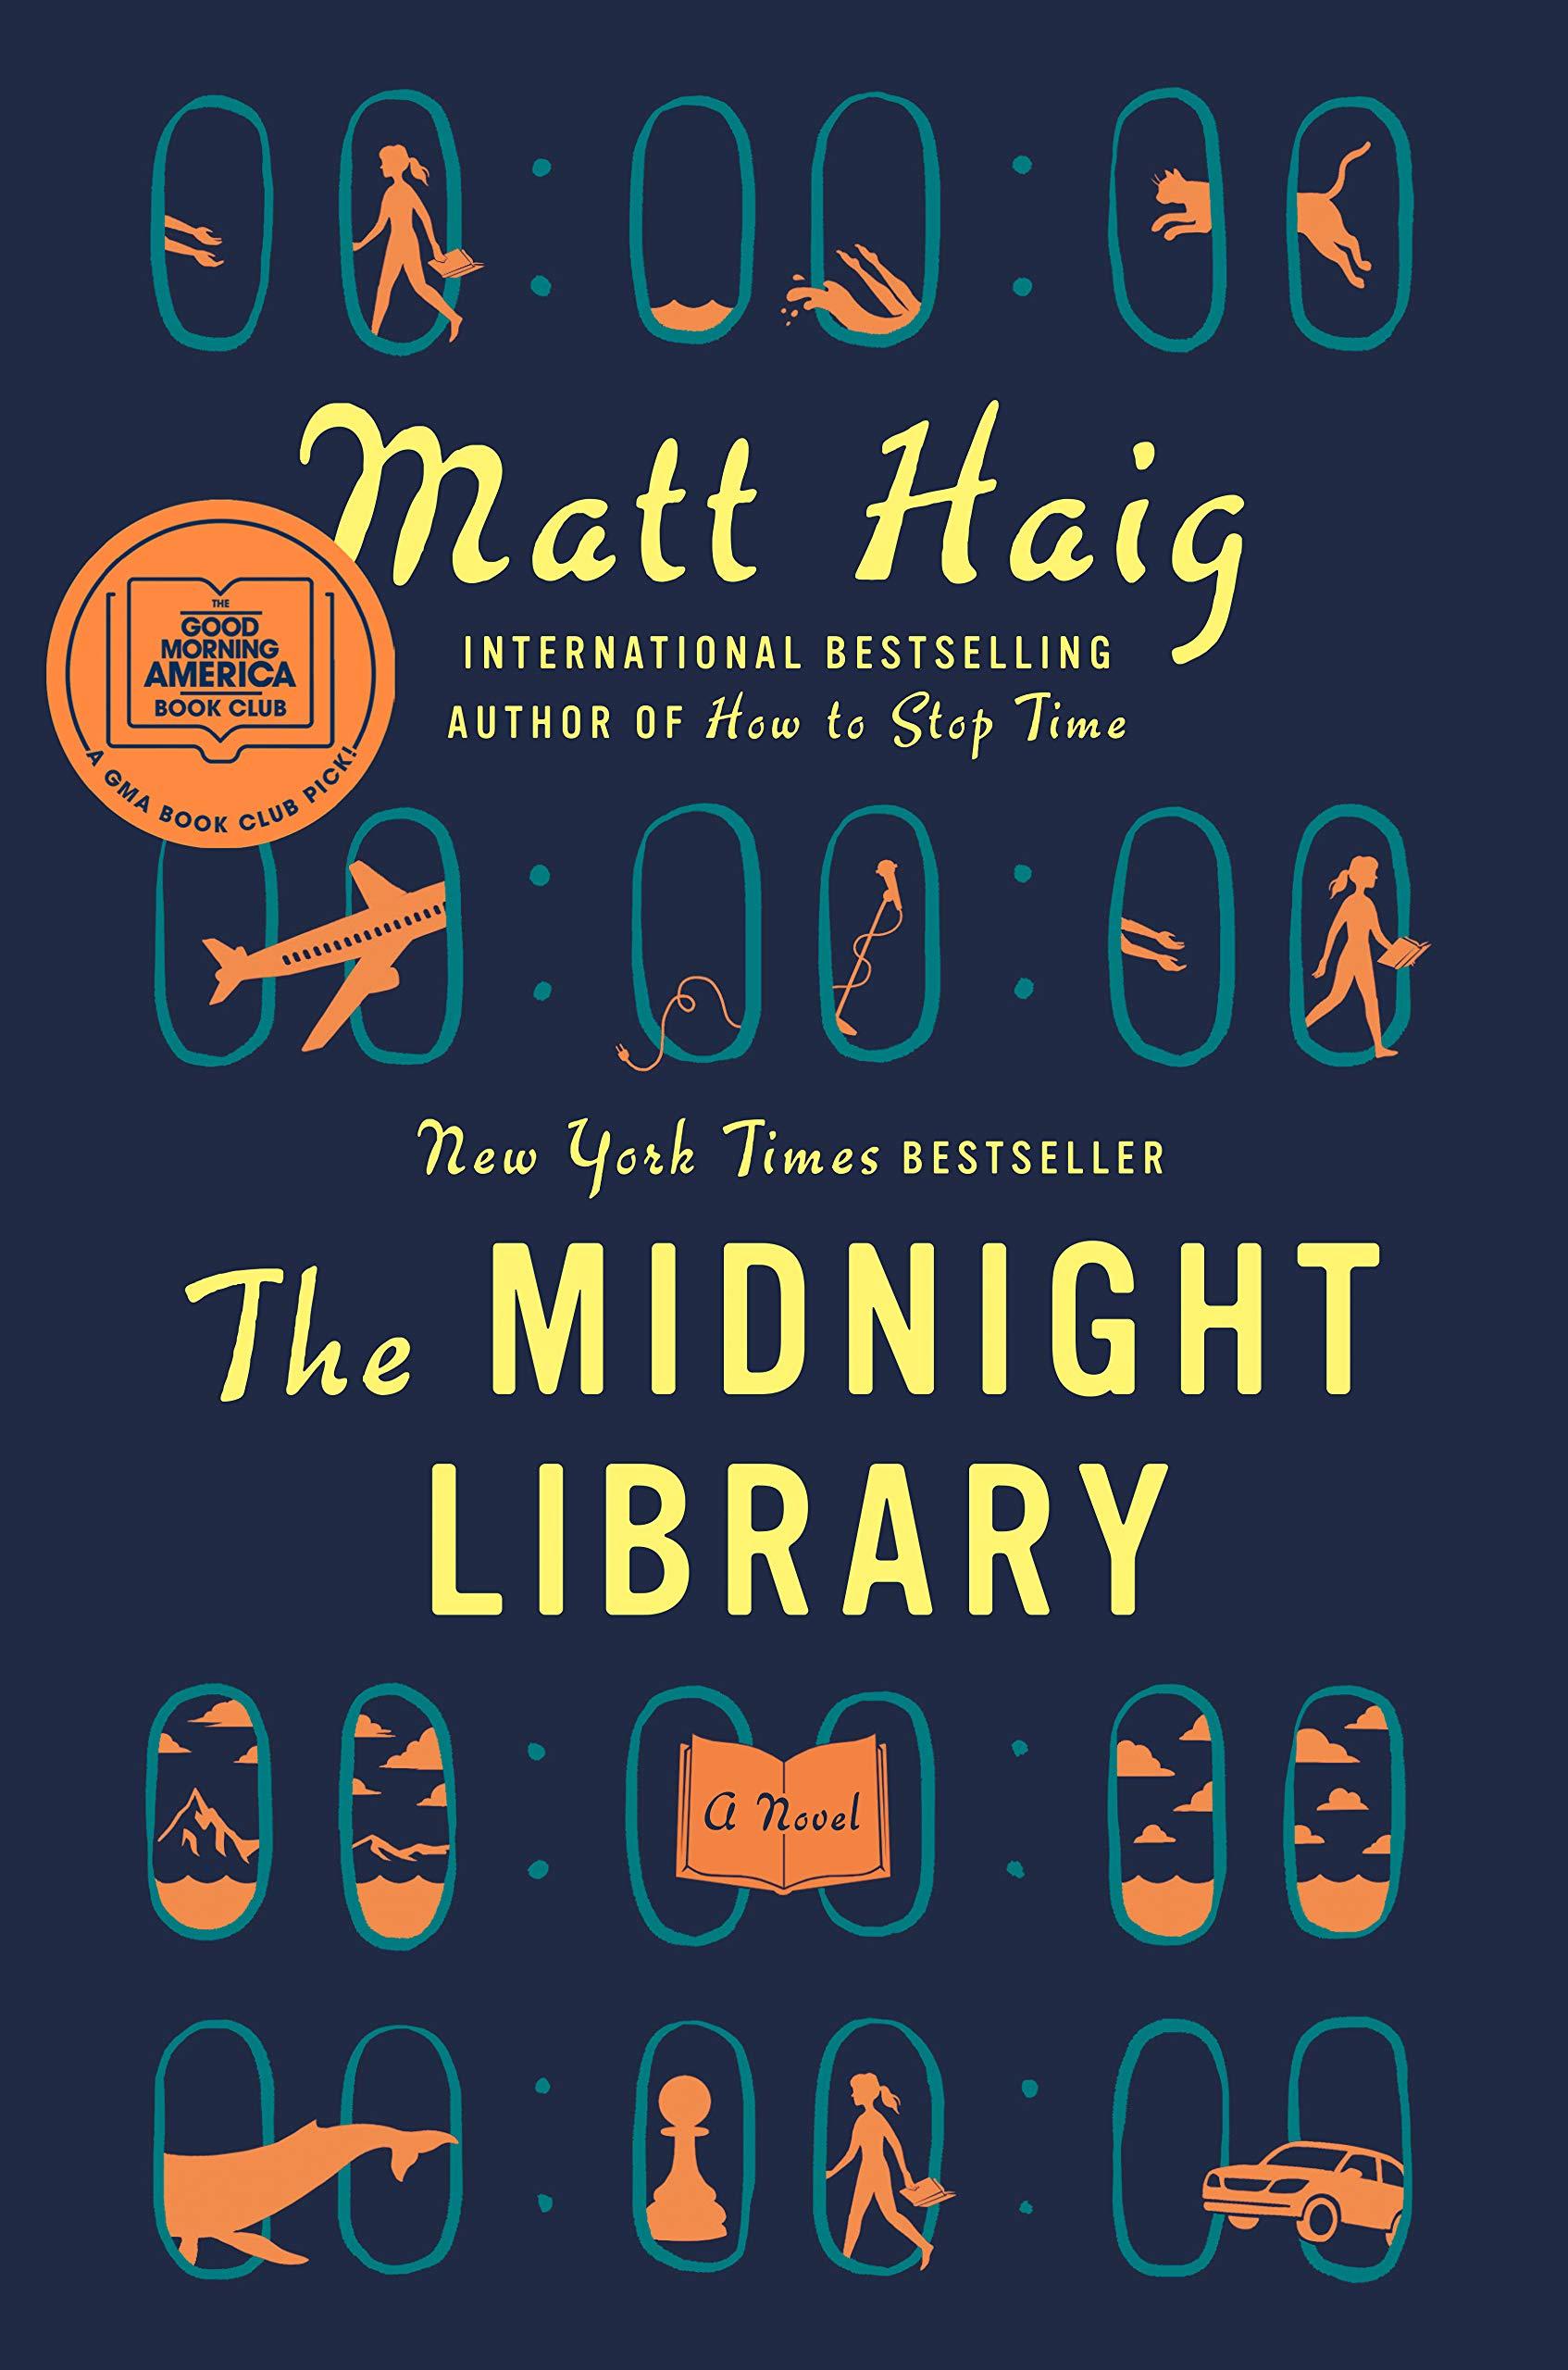 The Midnight Library: A Novel: Haig, Matt: 9780525559474: Amazon.com: Books